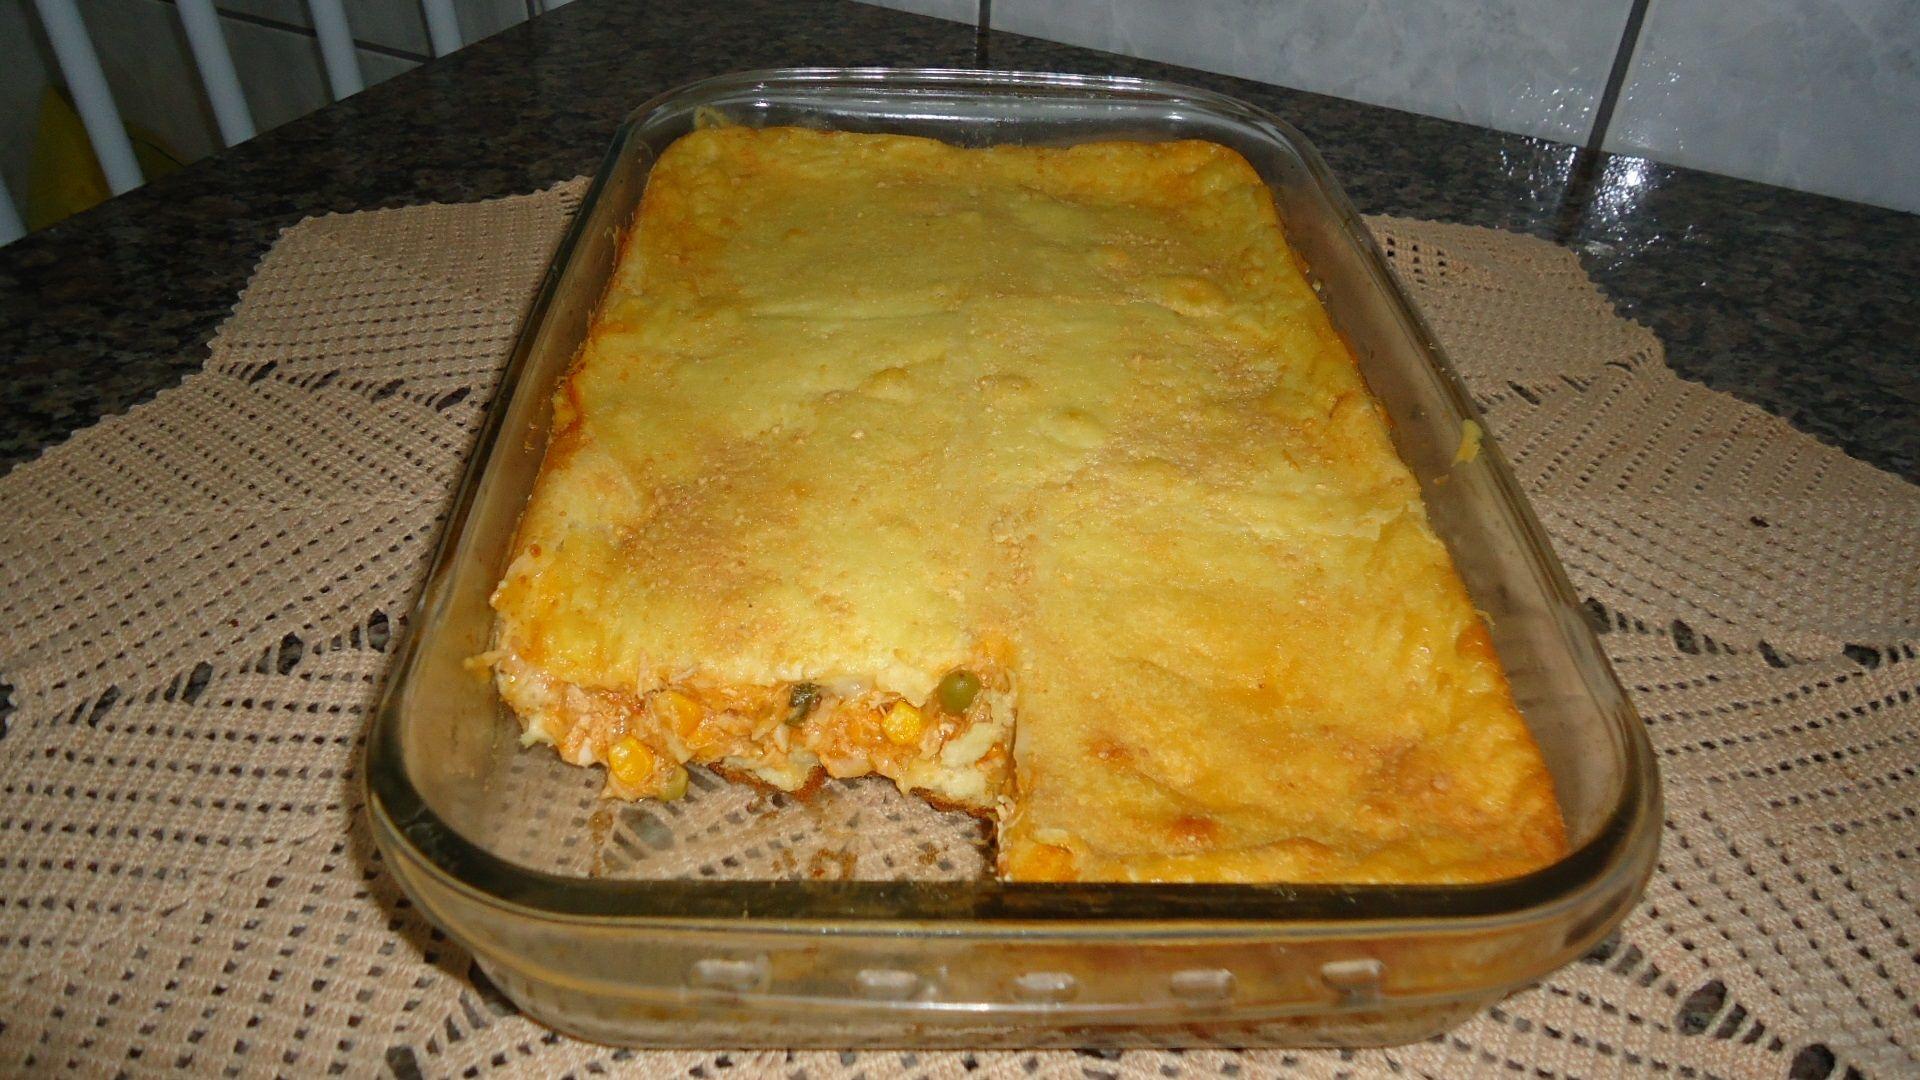 Receita de Torta salgada de liquidificador. Enviada por Rodriggo Silva e demora apenas 50 minutos.